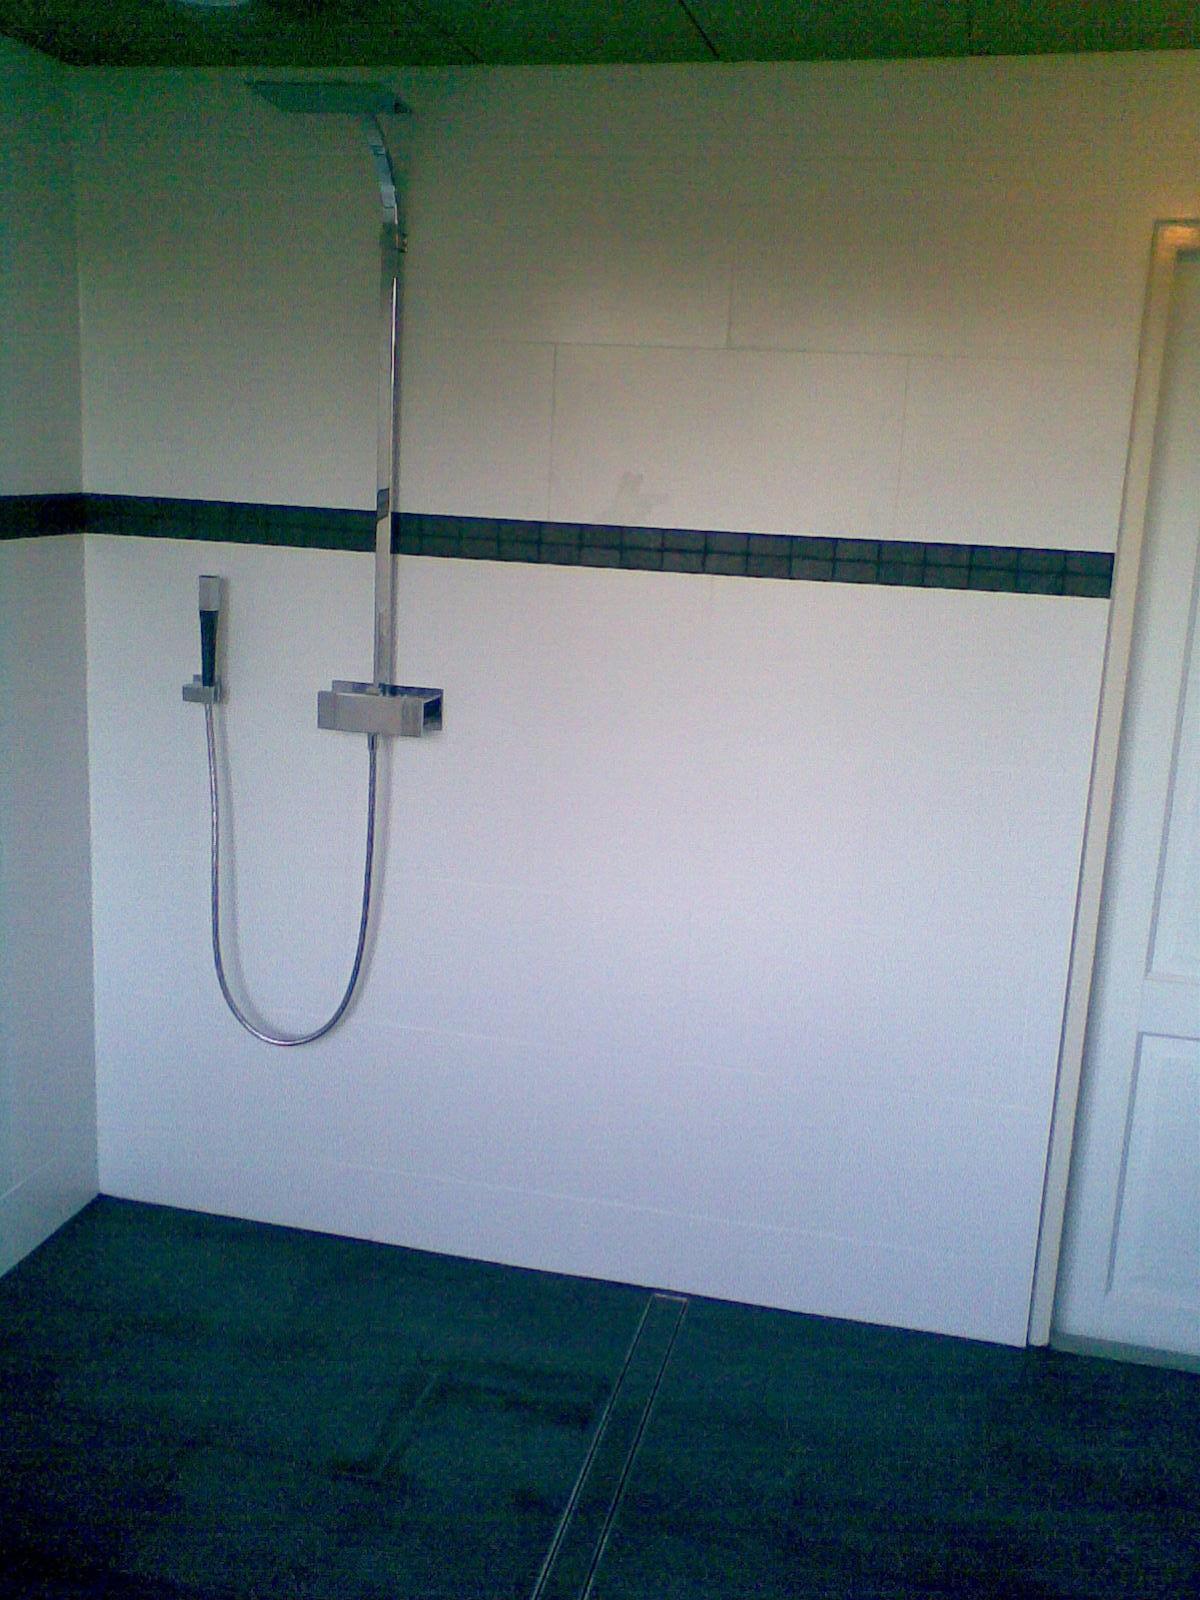 Badkamer Zeewolde vergroot dmv dakkapel wandradiator en inbouw toilet